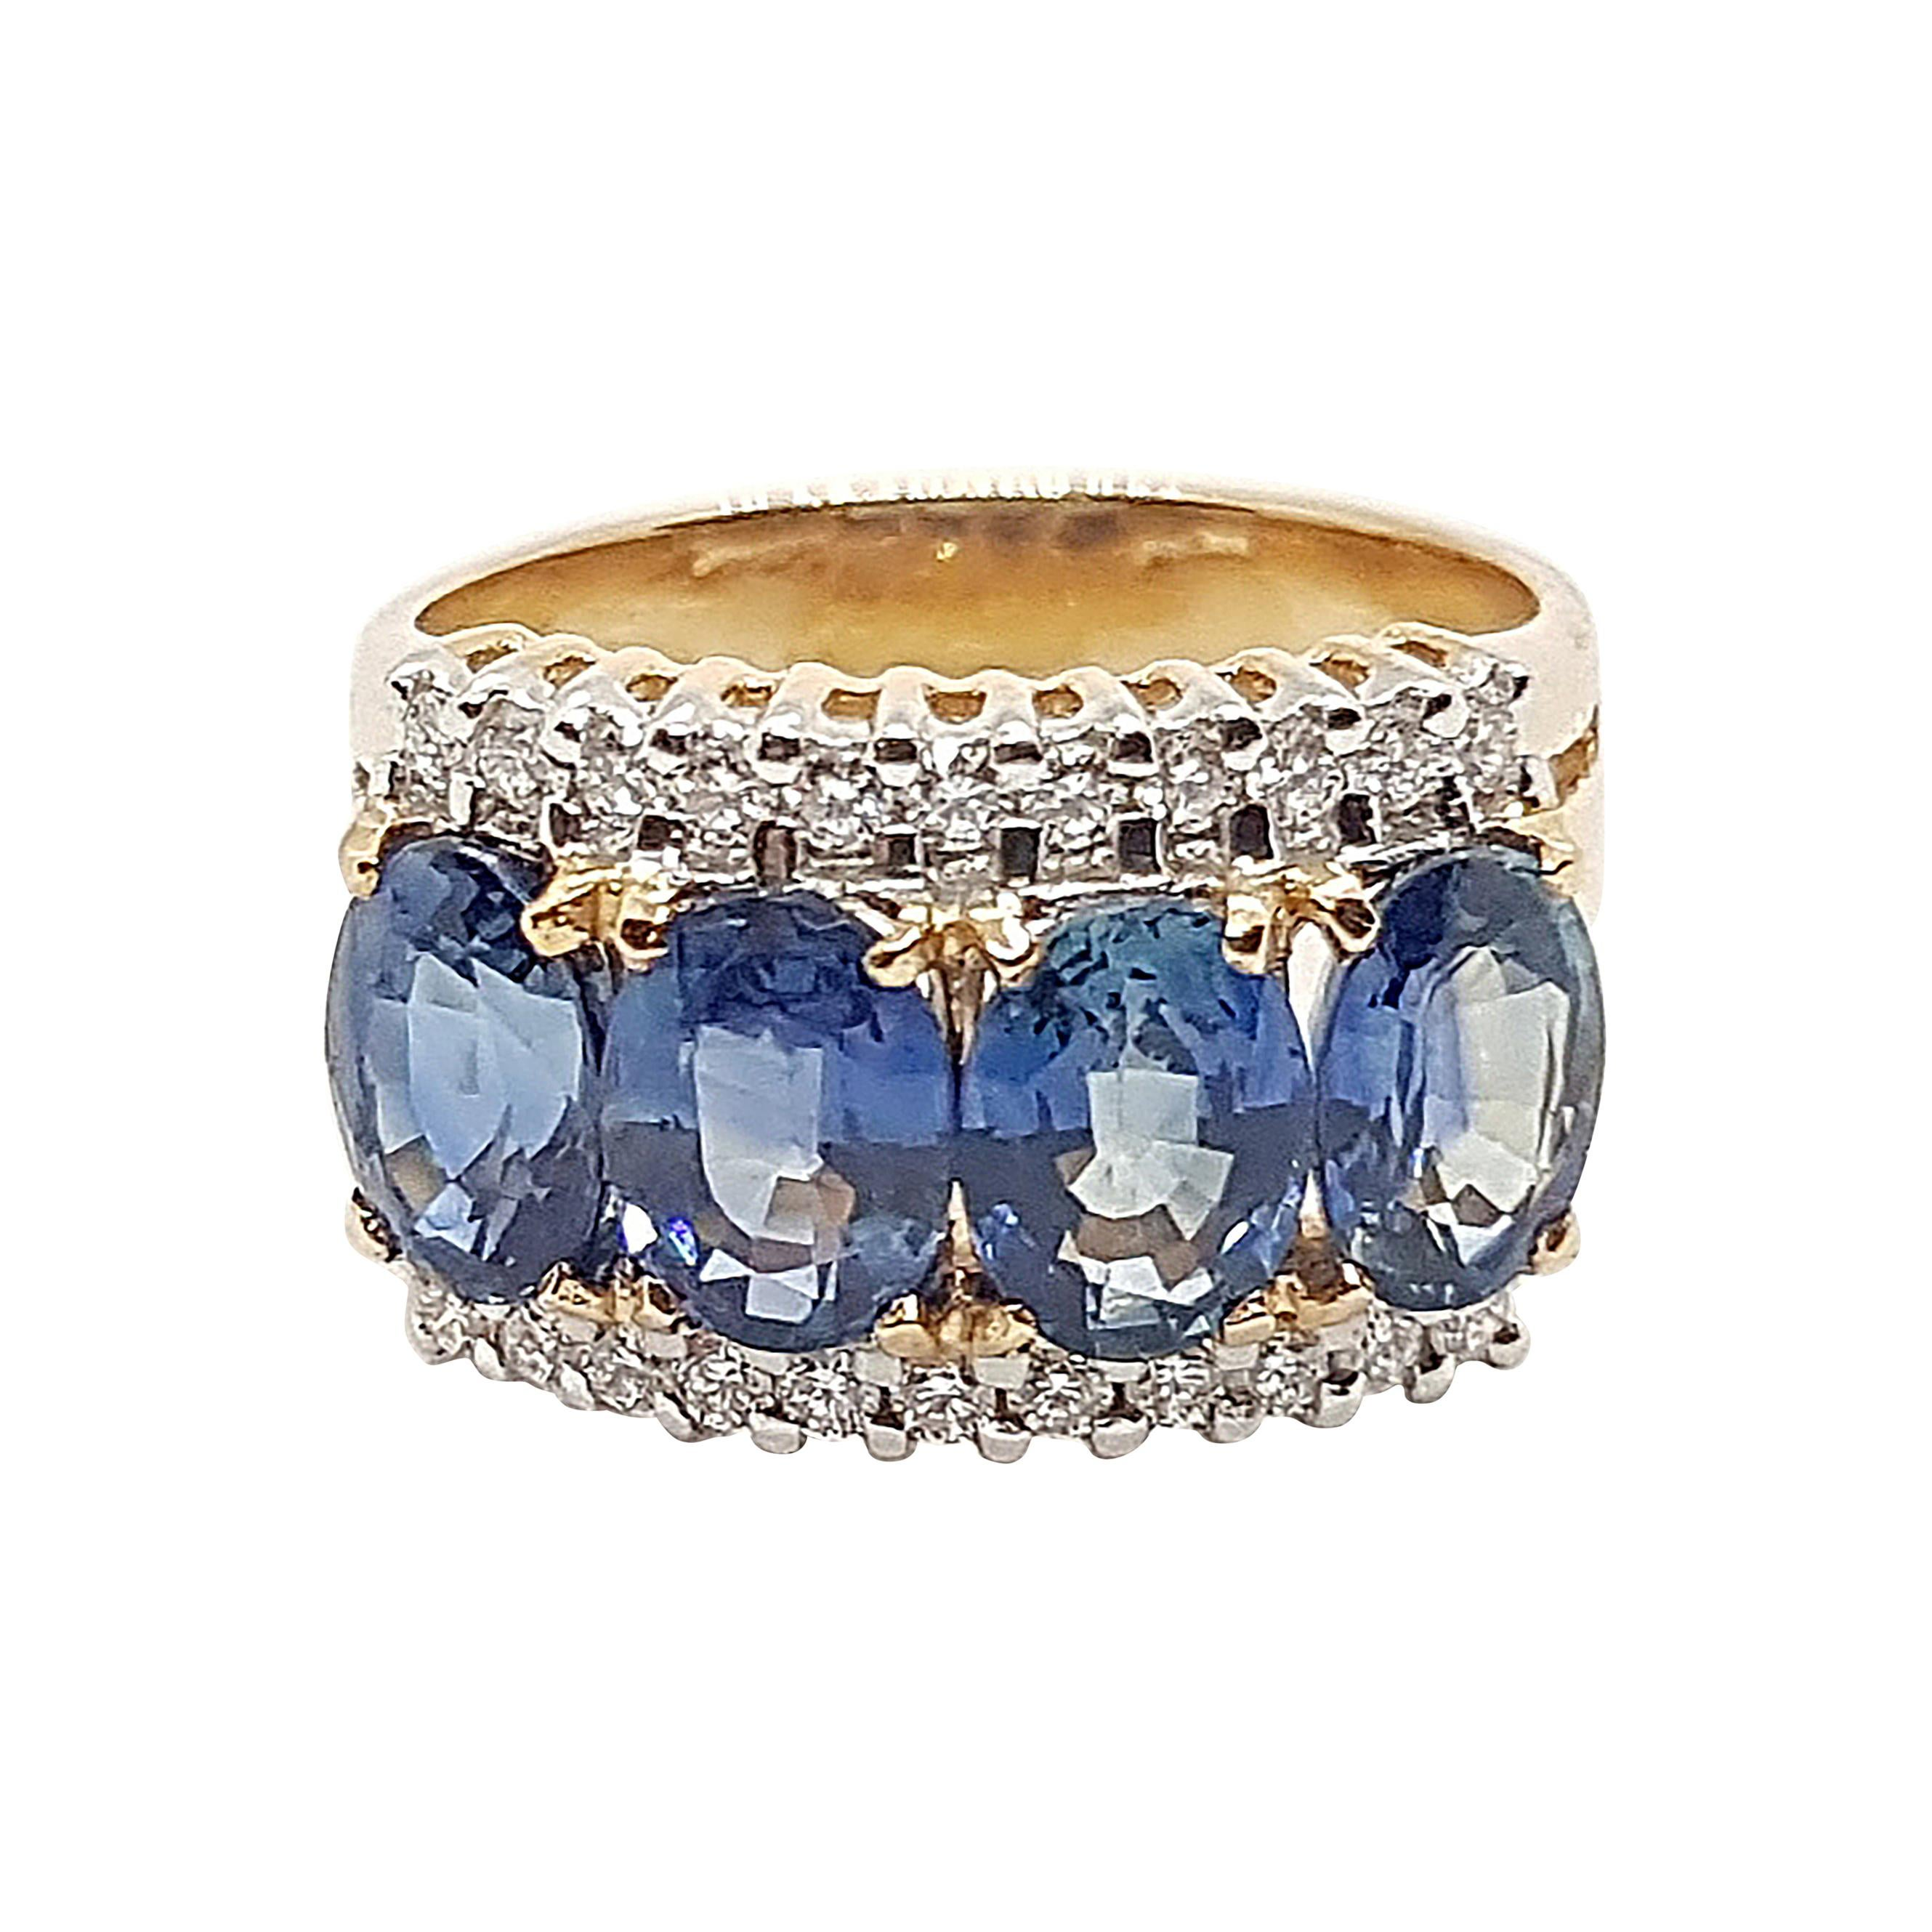 Blue Sapphire with Diamond Ring Set in 18 Karat Rose Gold Settings